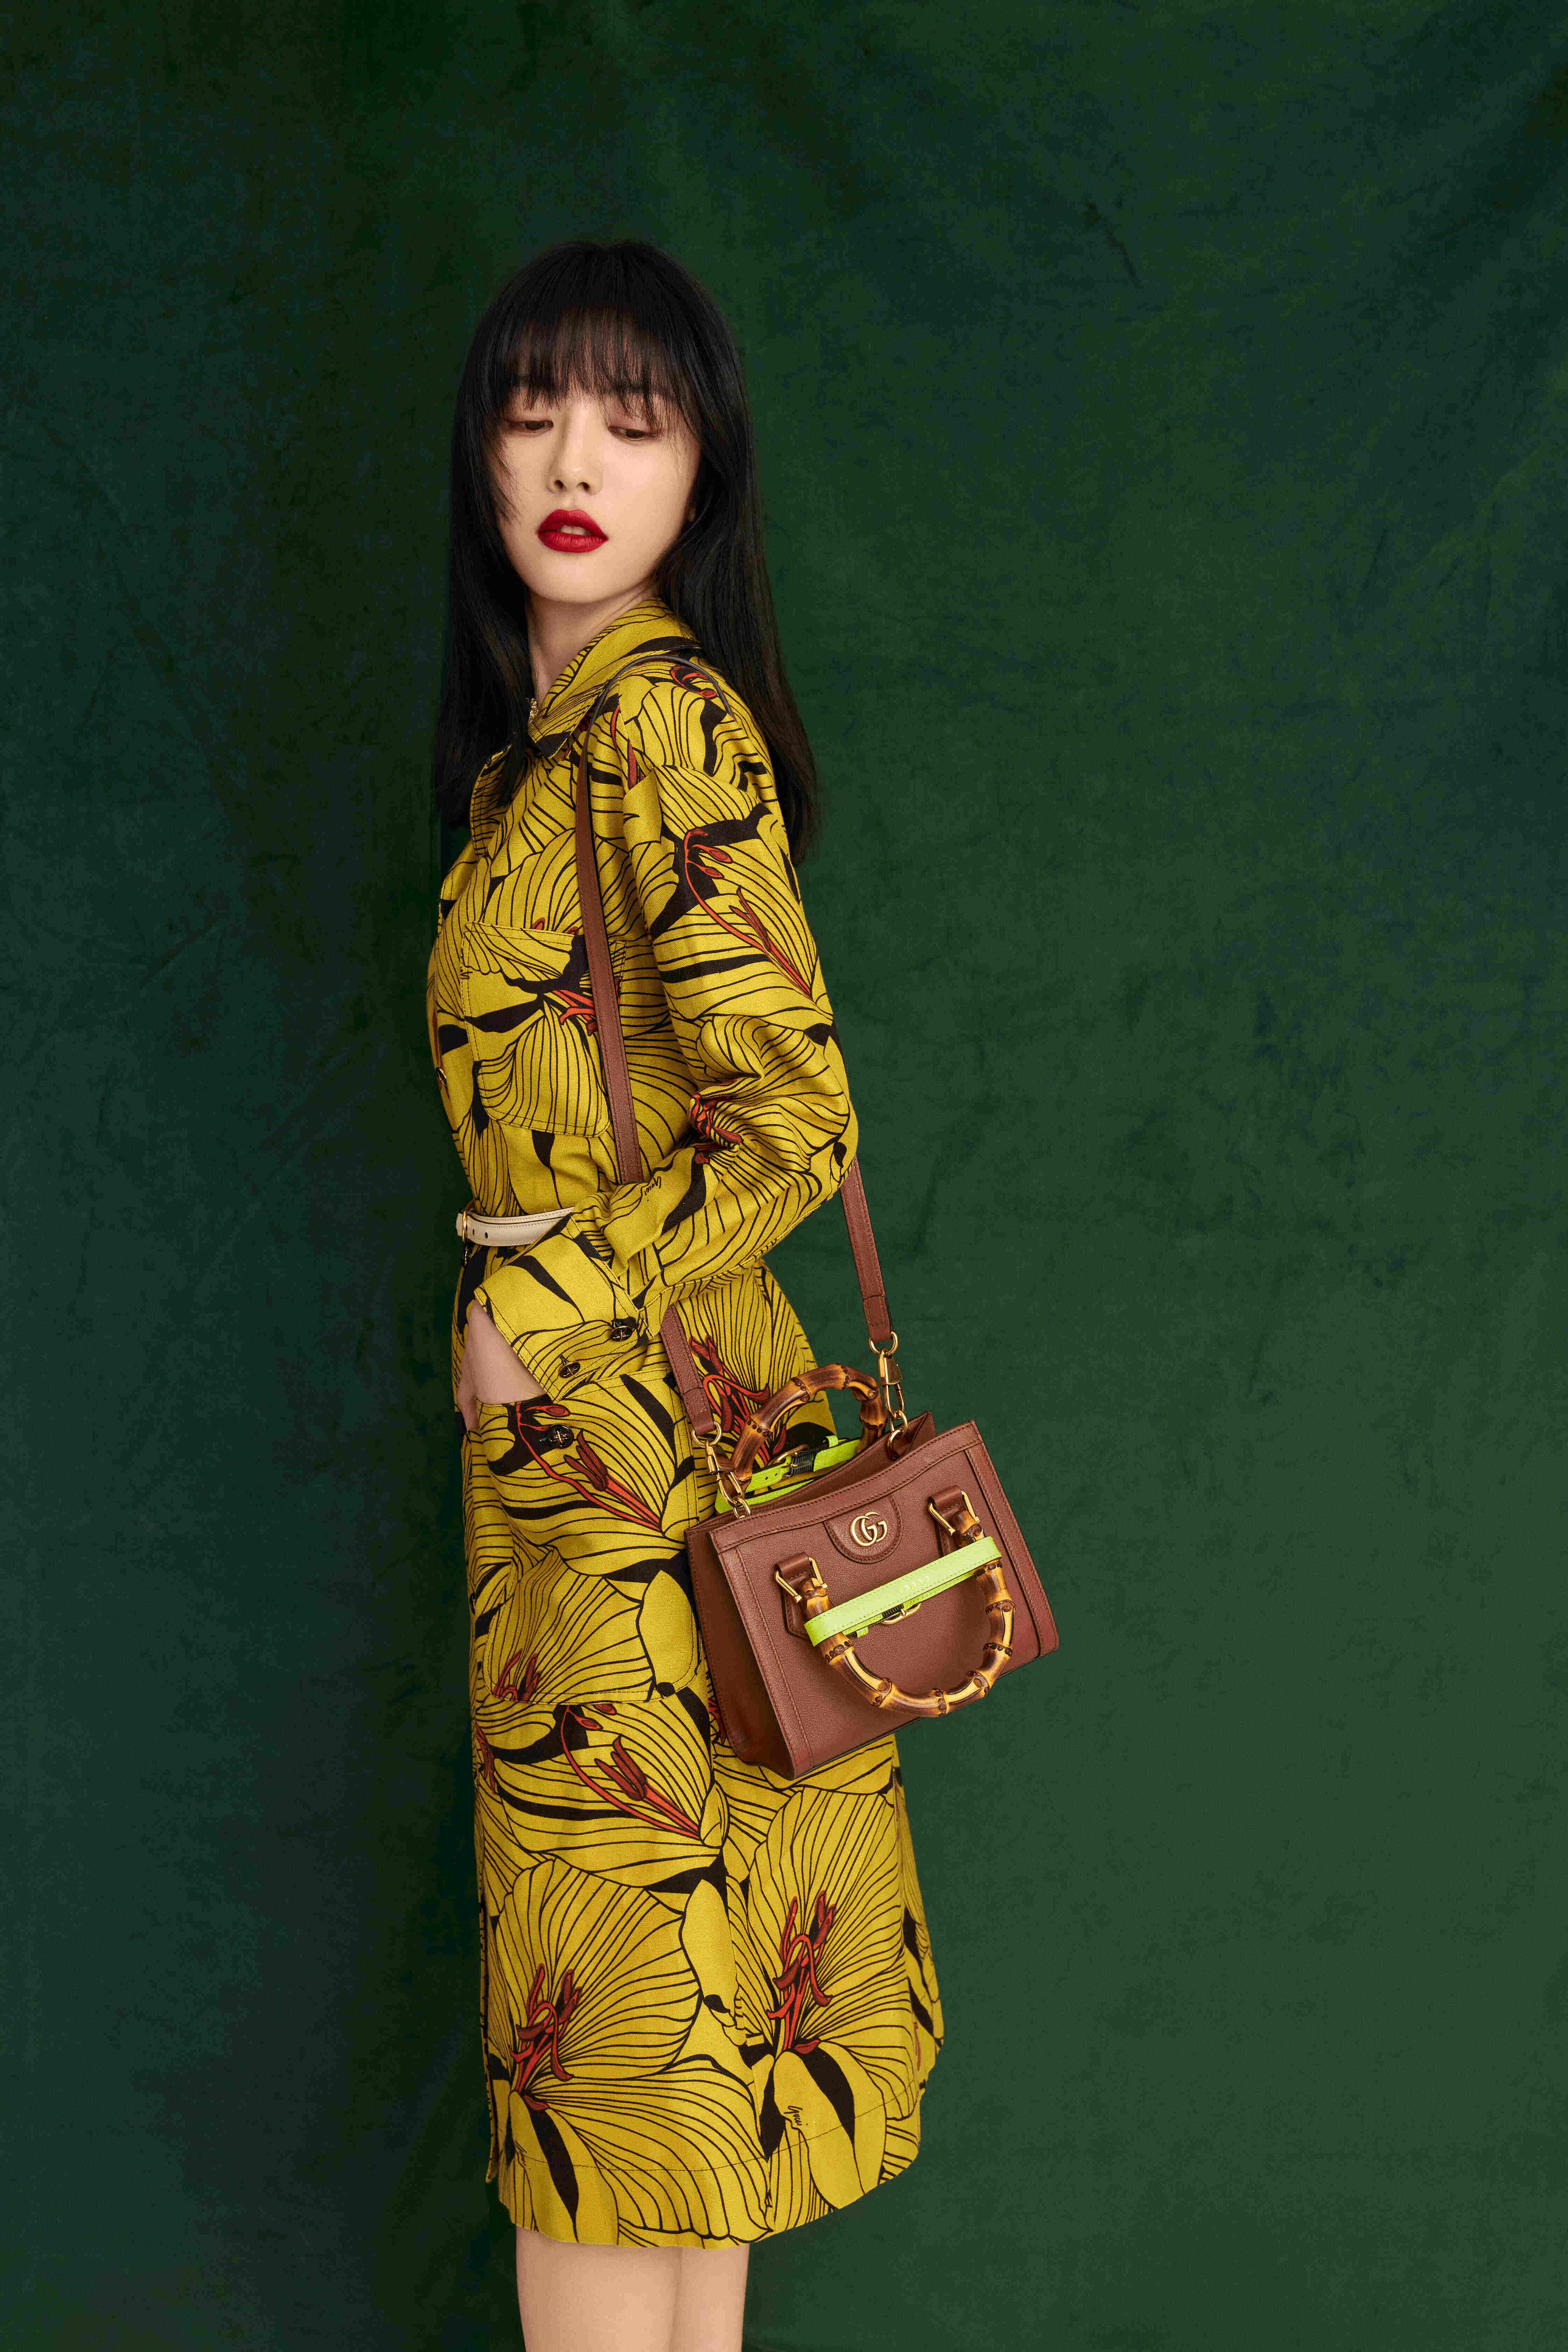 Cai Wenjing carrying the Gucci 'Diana' mini tote bag